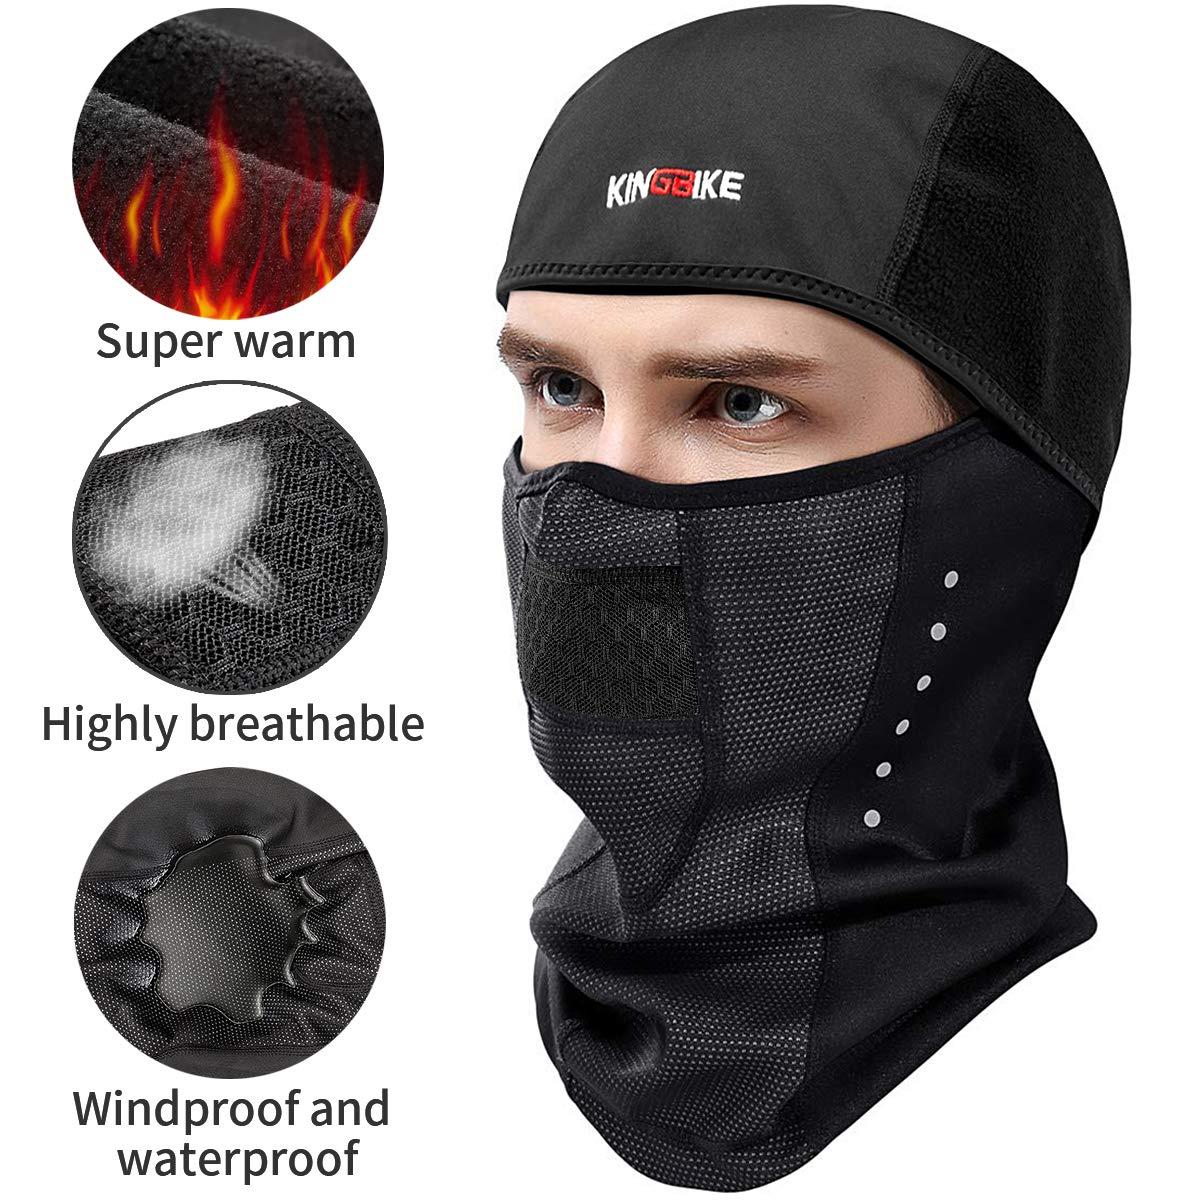 KINGBIKE Winter Ski Mask Balaclava Waterproof Windproof Face Mask Thermal Micro-Polar Fleece for Men Women Cold Skiing Motorcyle Mortorbike Bike Cycling Tactical (Black, Plus-Size) TSZ000376L